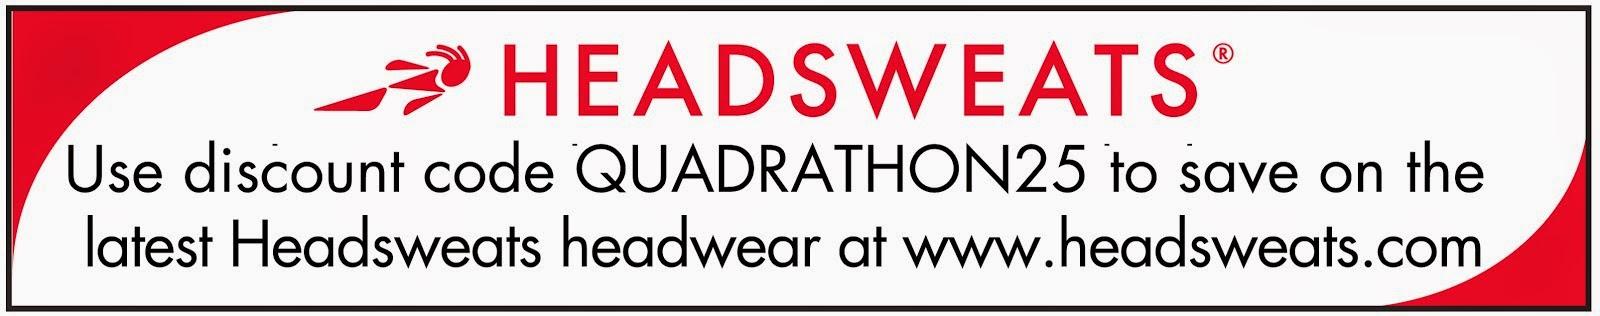 I'm a Headsweat Ambassador